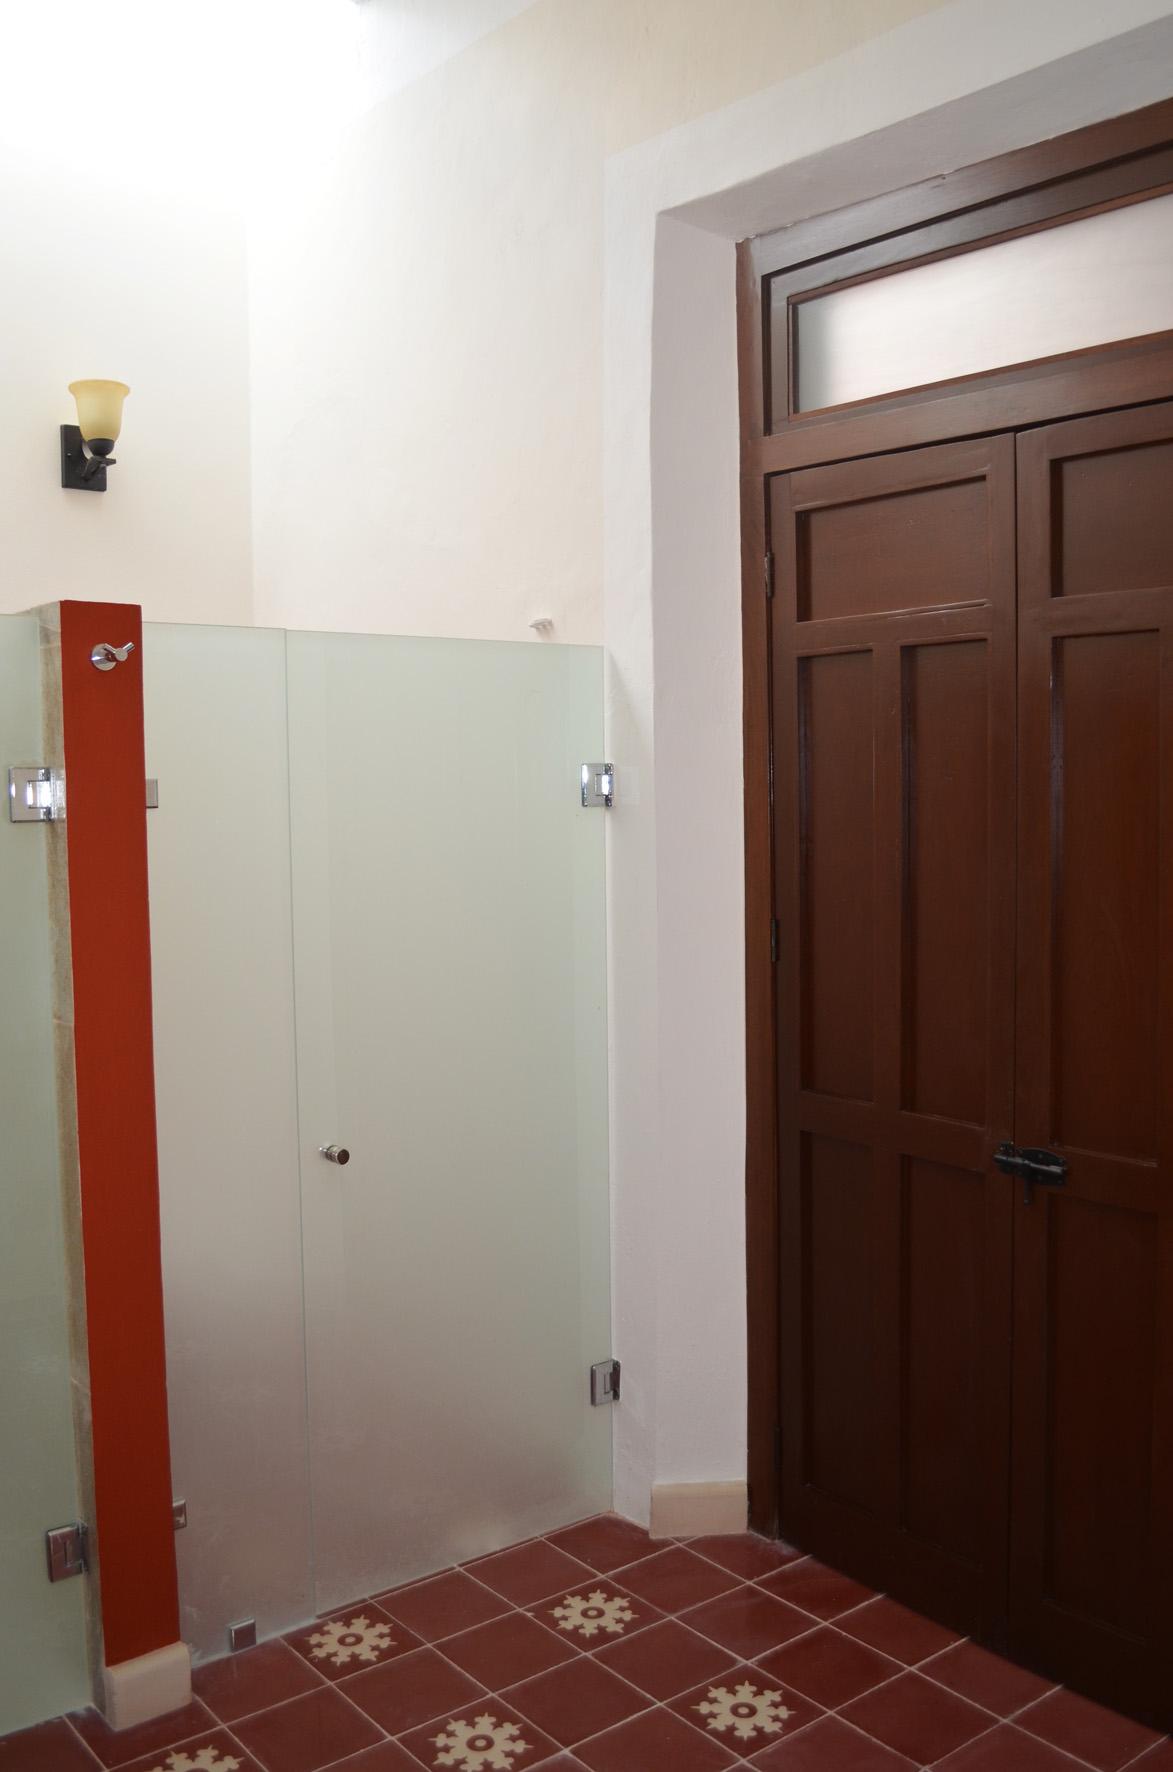 San Teodoro, master bathroom 3